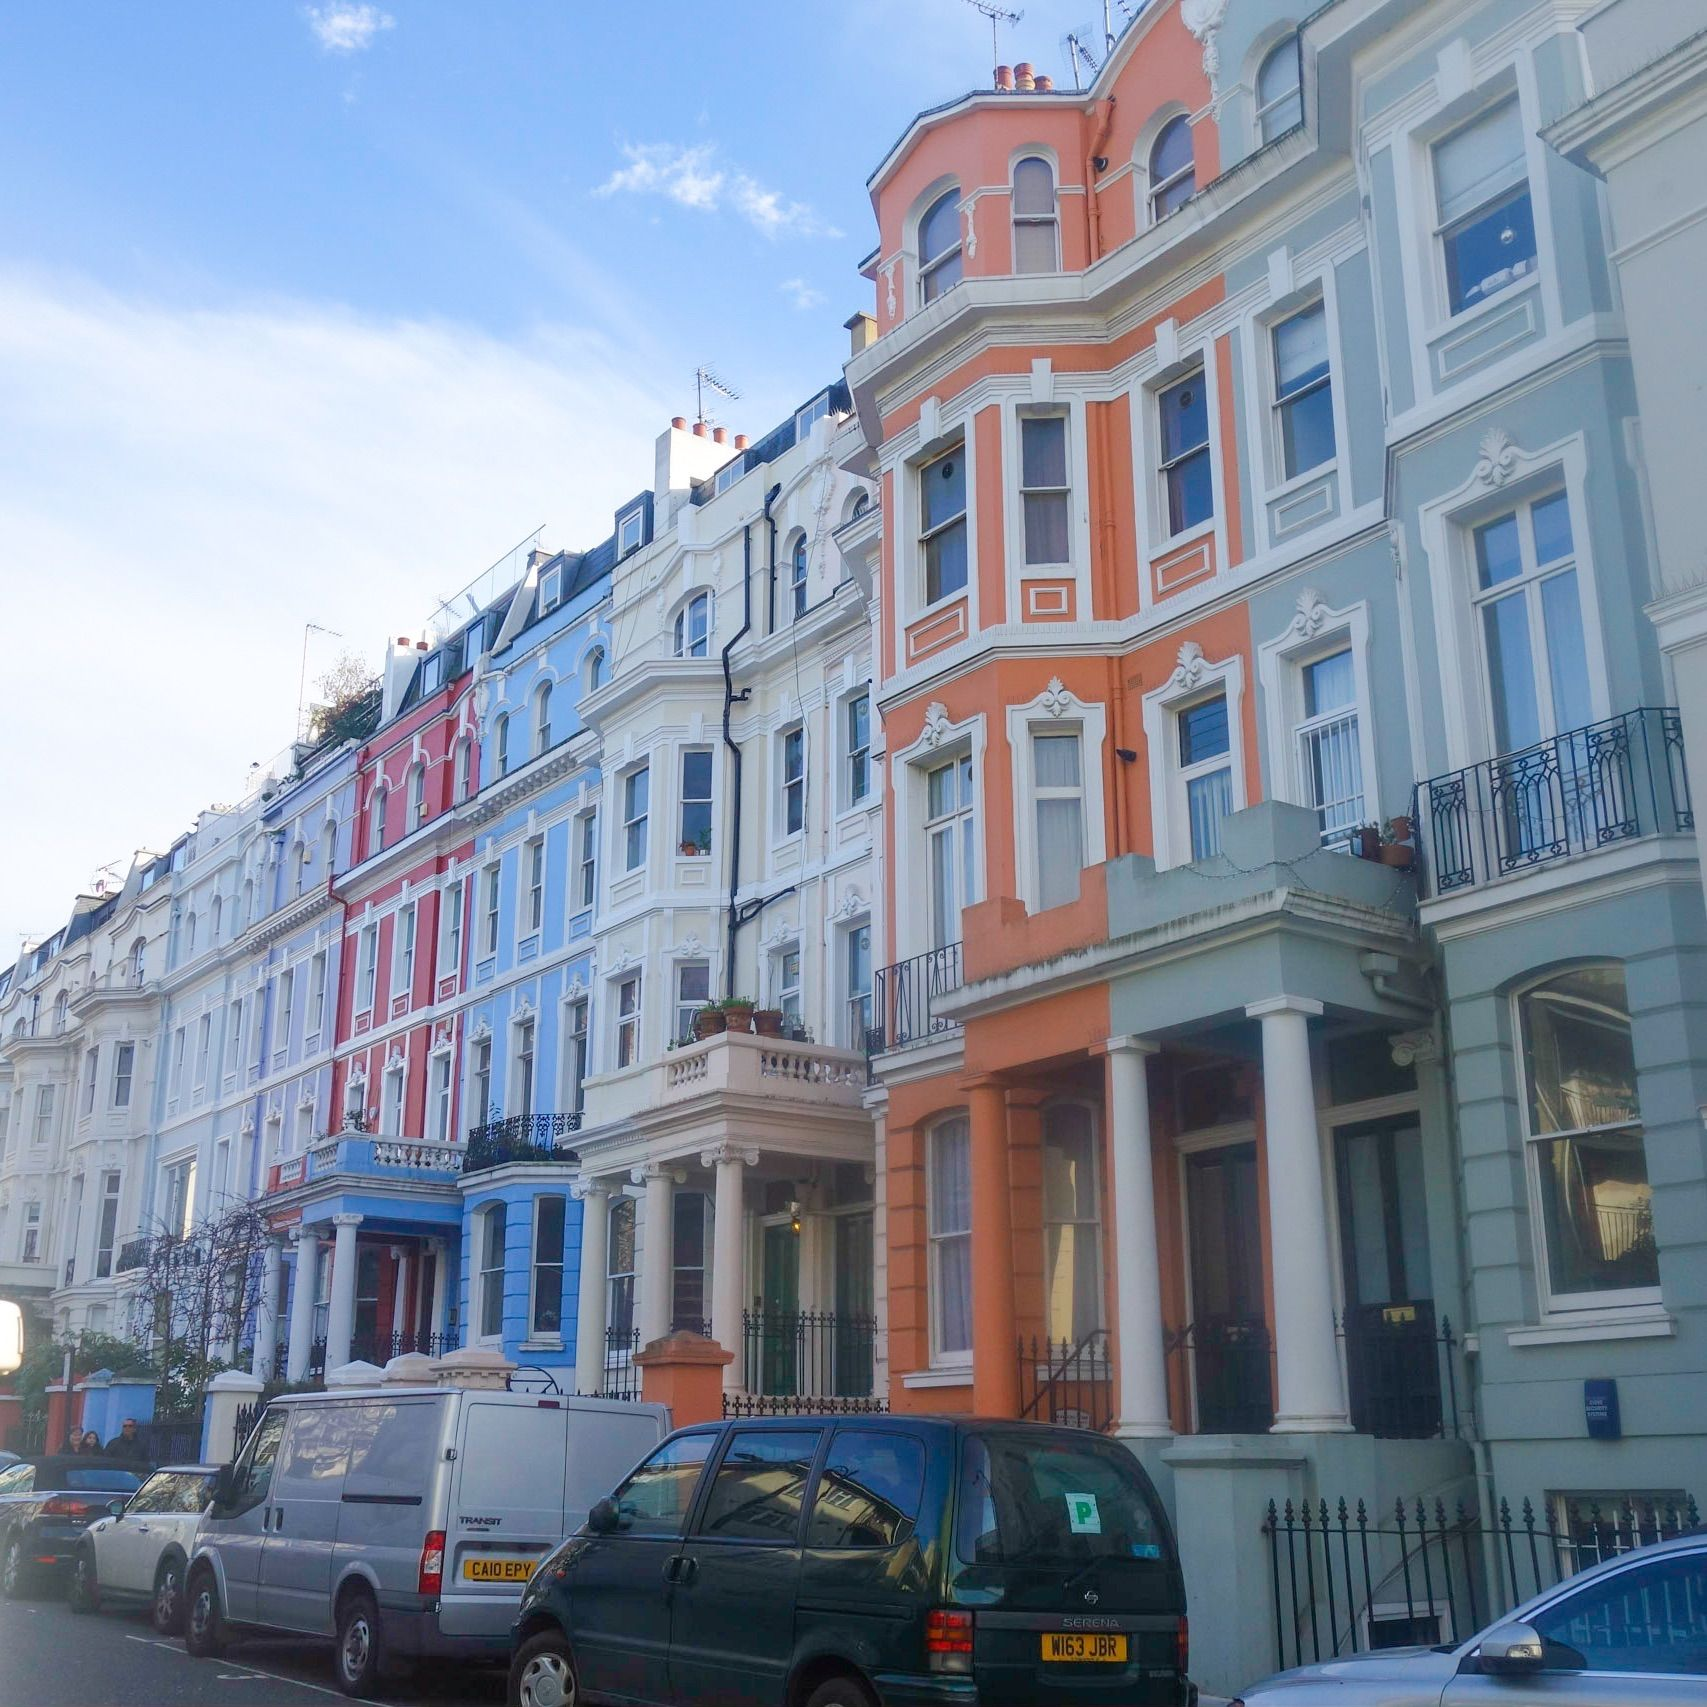 Beautiful colourful houses near Portobello Market, West London ...